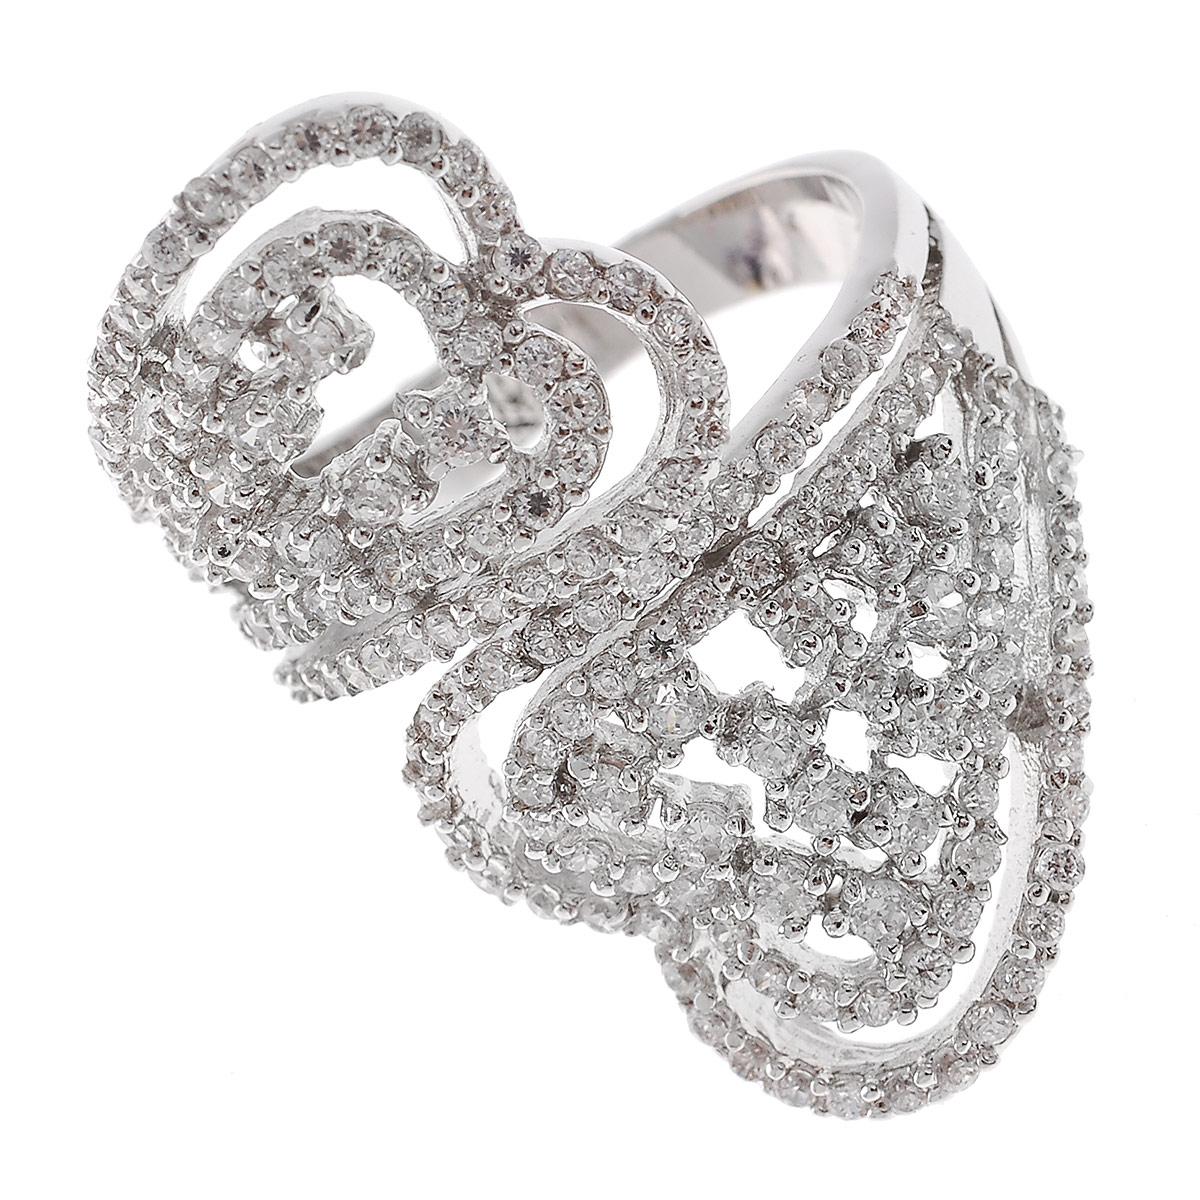 "Кольцо ""Lovely Jewelry"", цвет: серебристый. Размер 17. КС1002 Moda cosa alla"